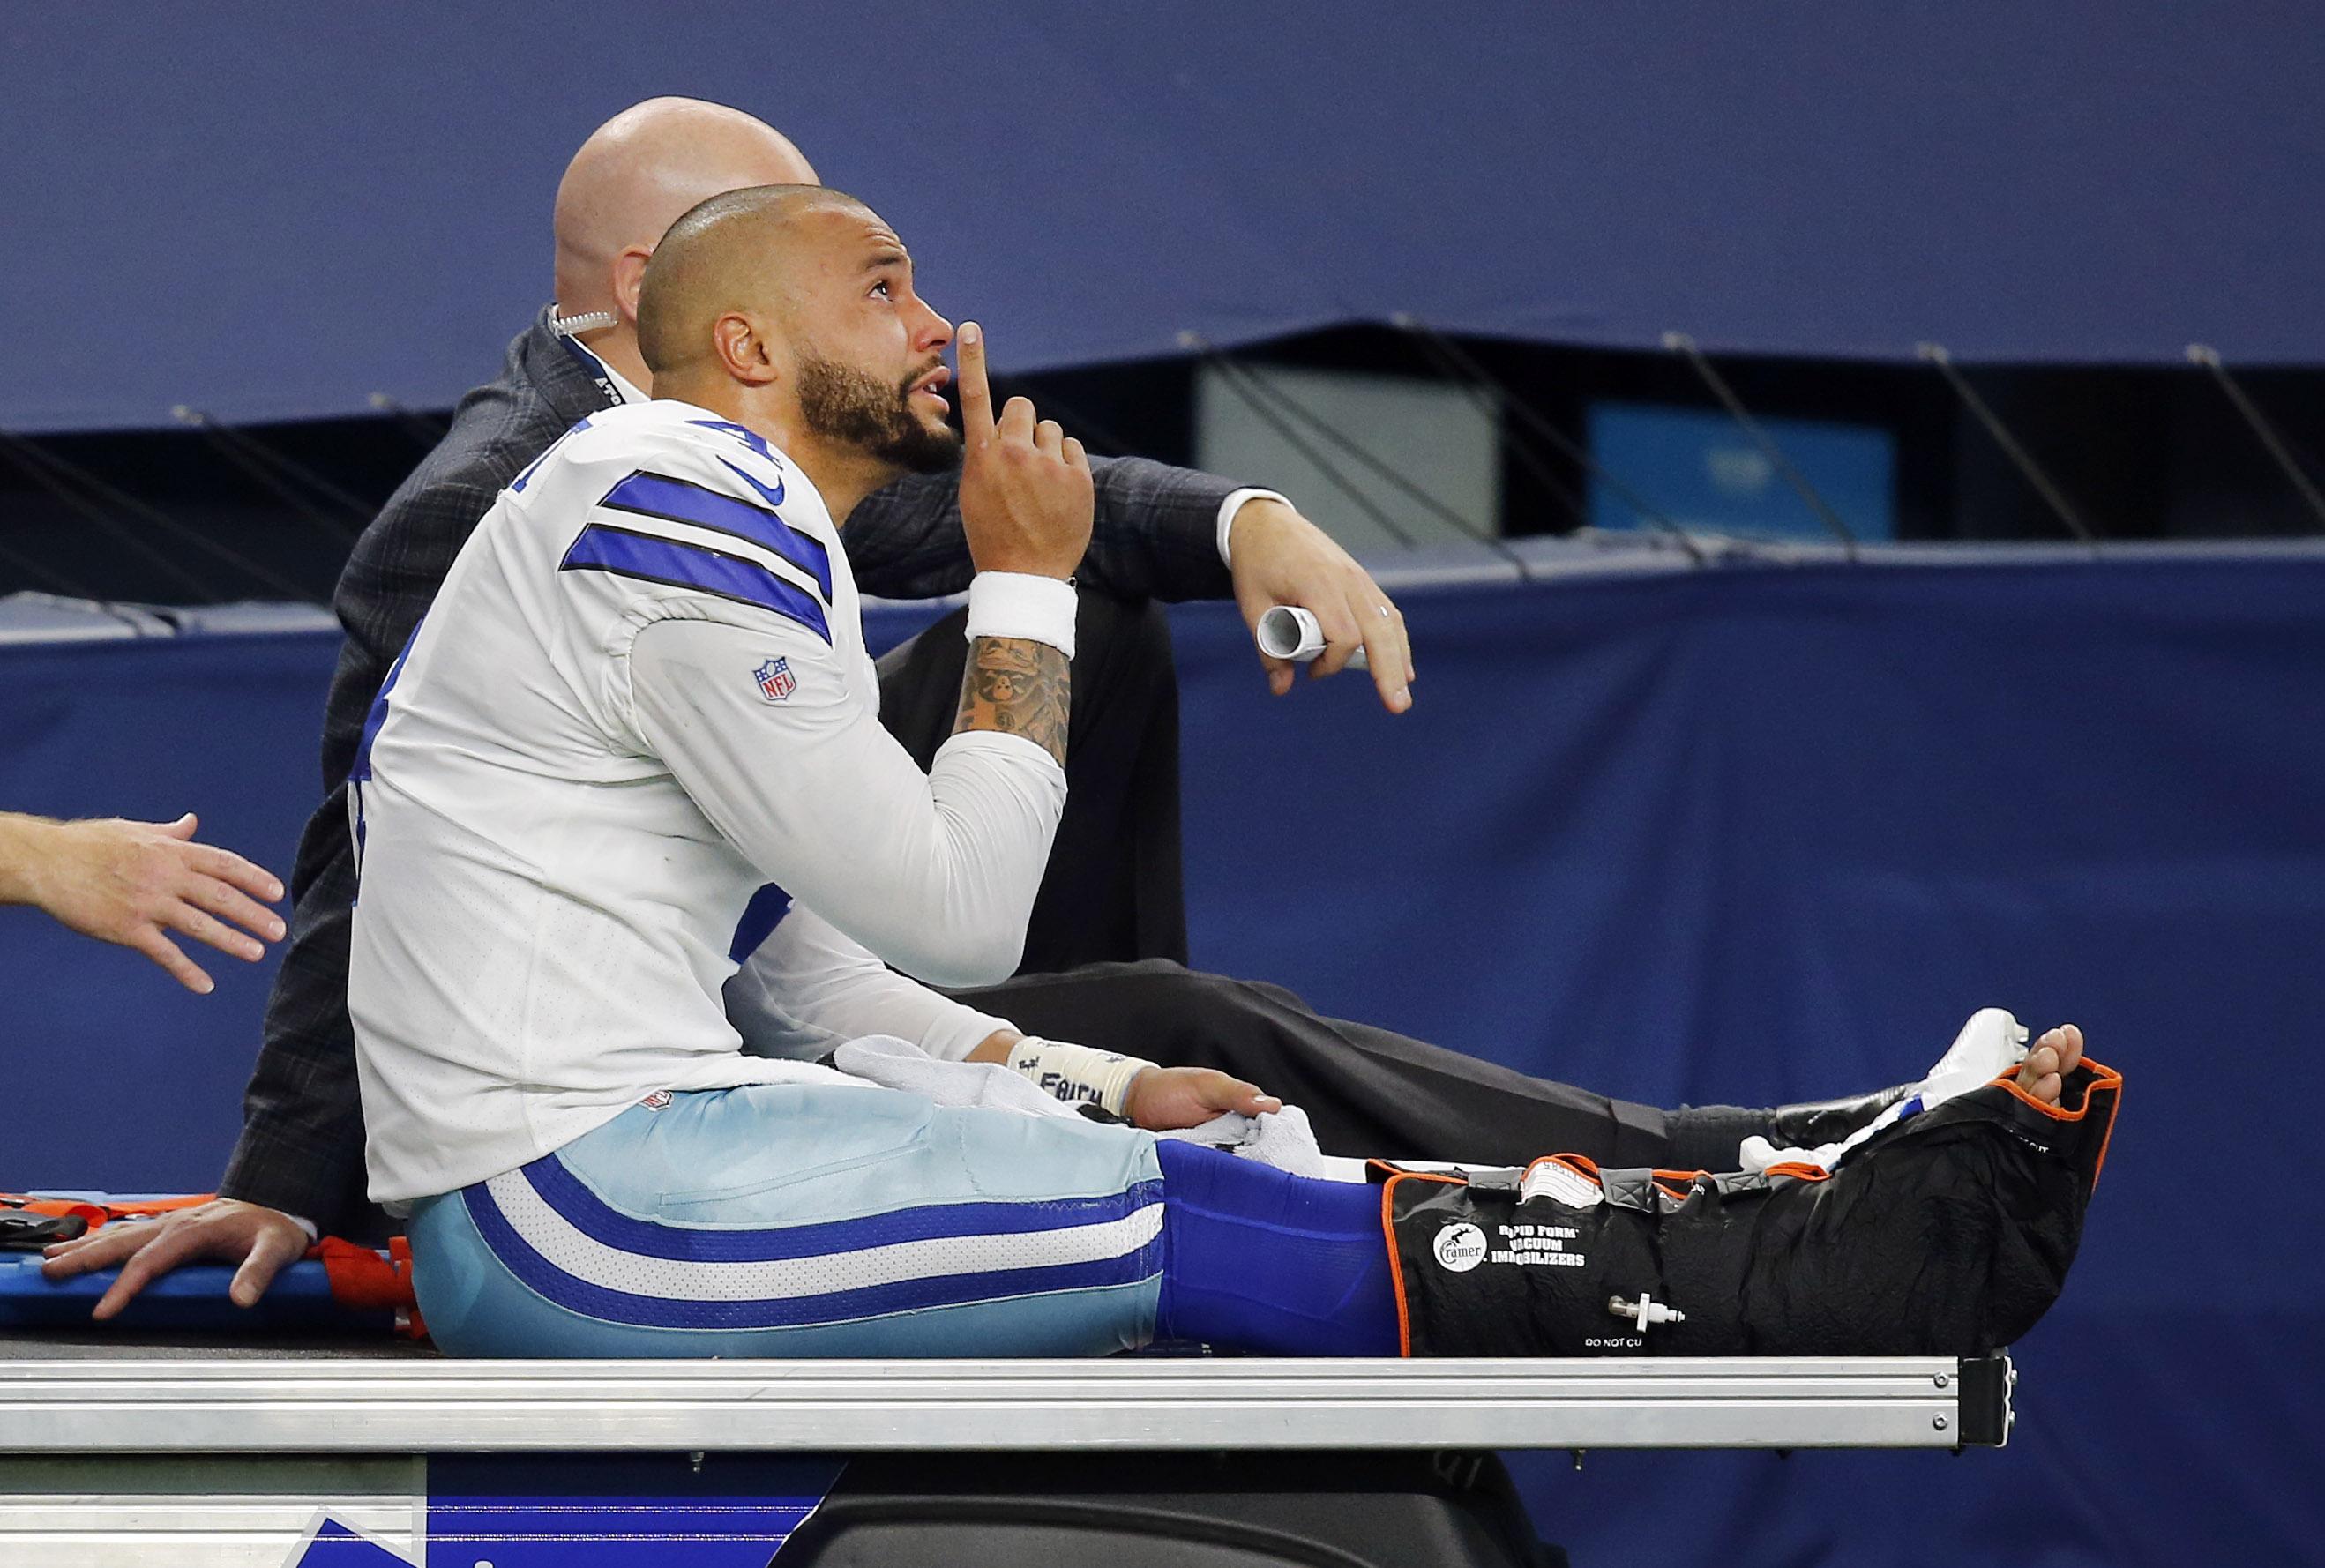 Big win, bigger loss: Cowboys, Dak Prescott let emotions flow after QB's devastating ankle injury